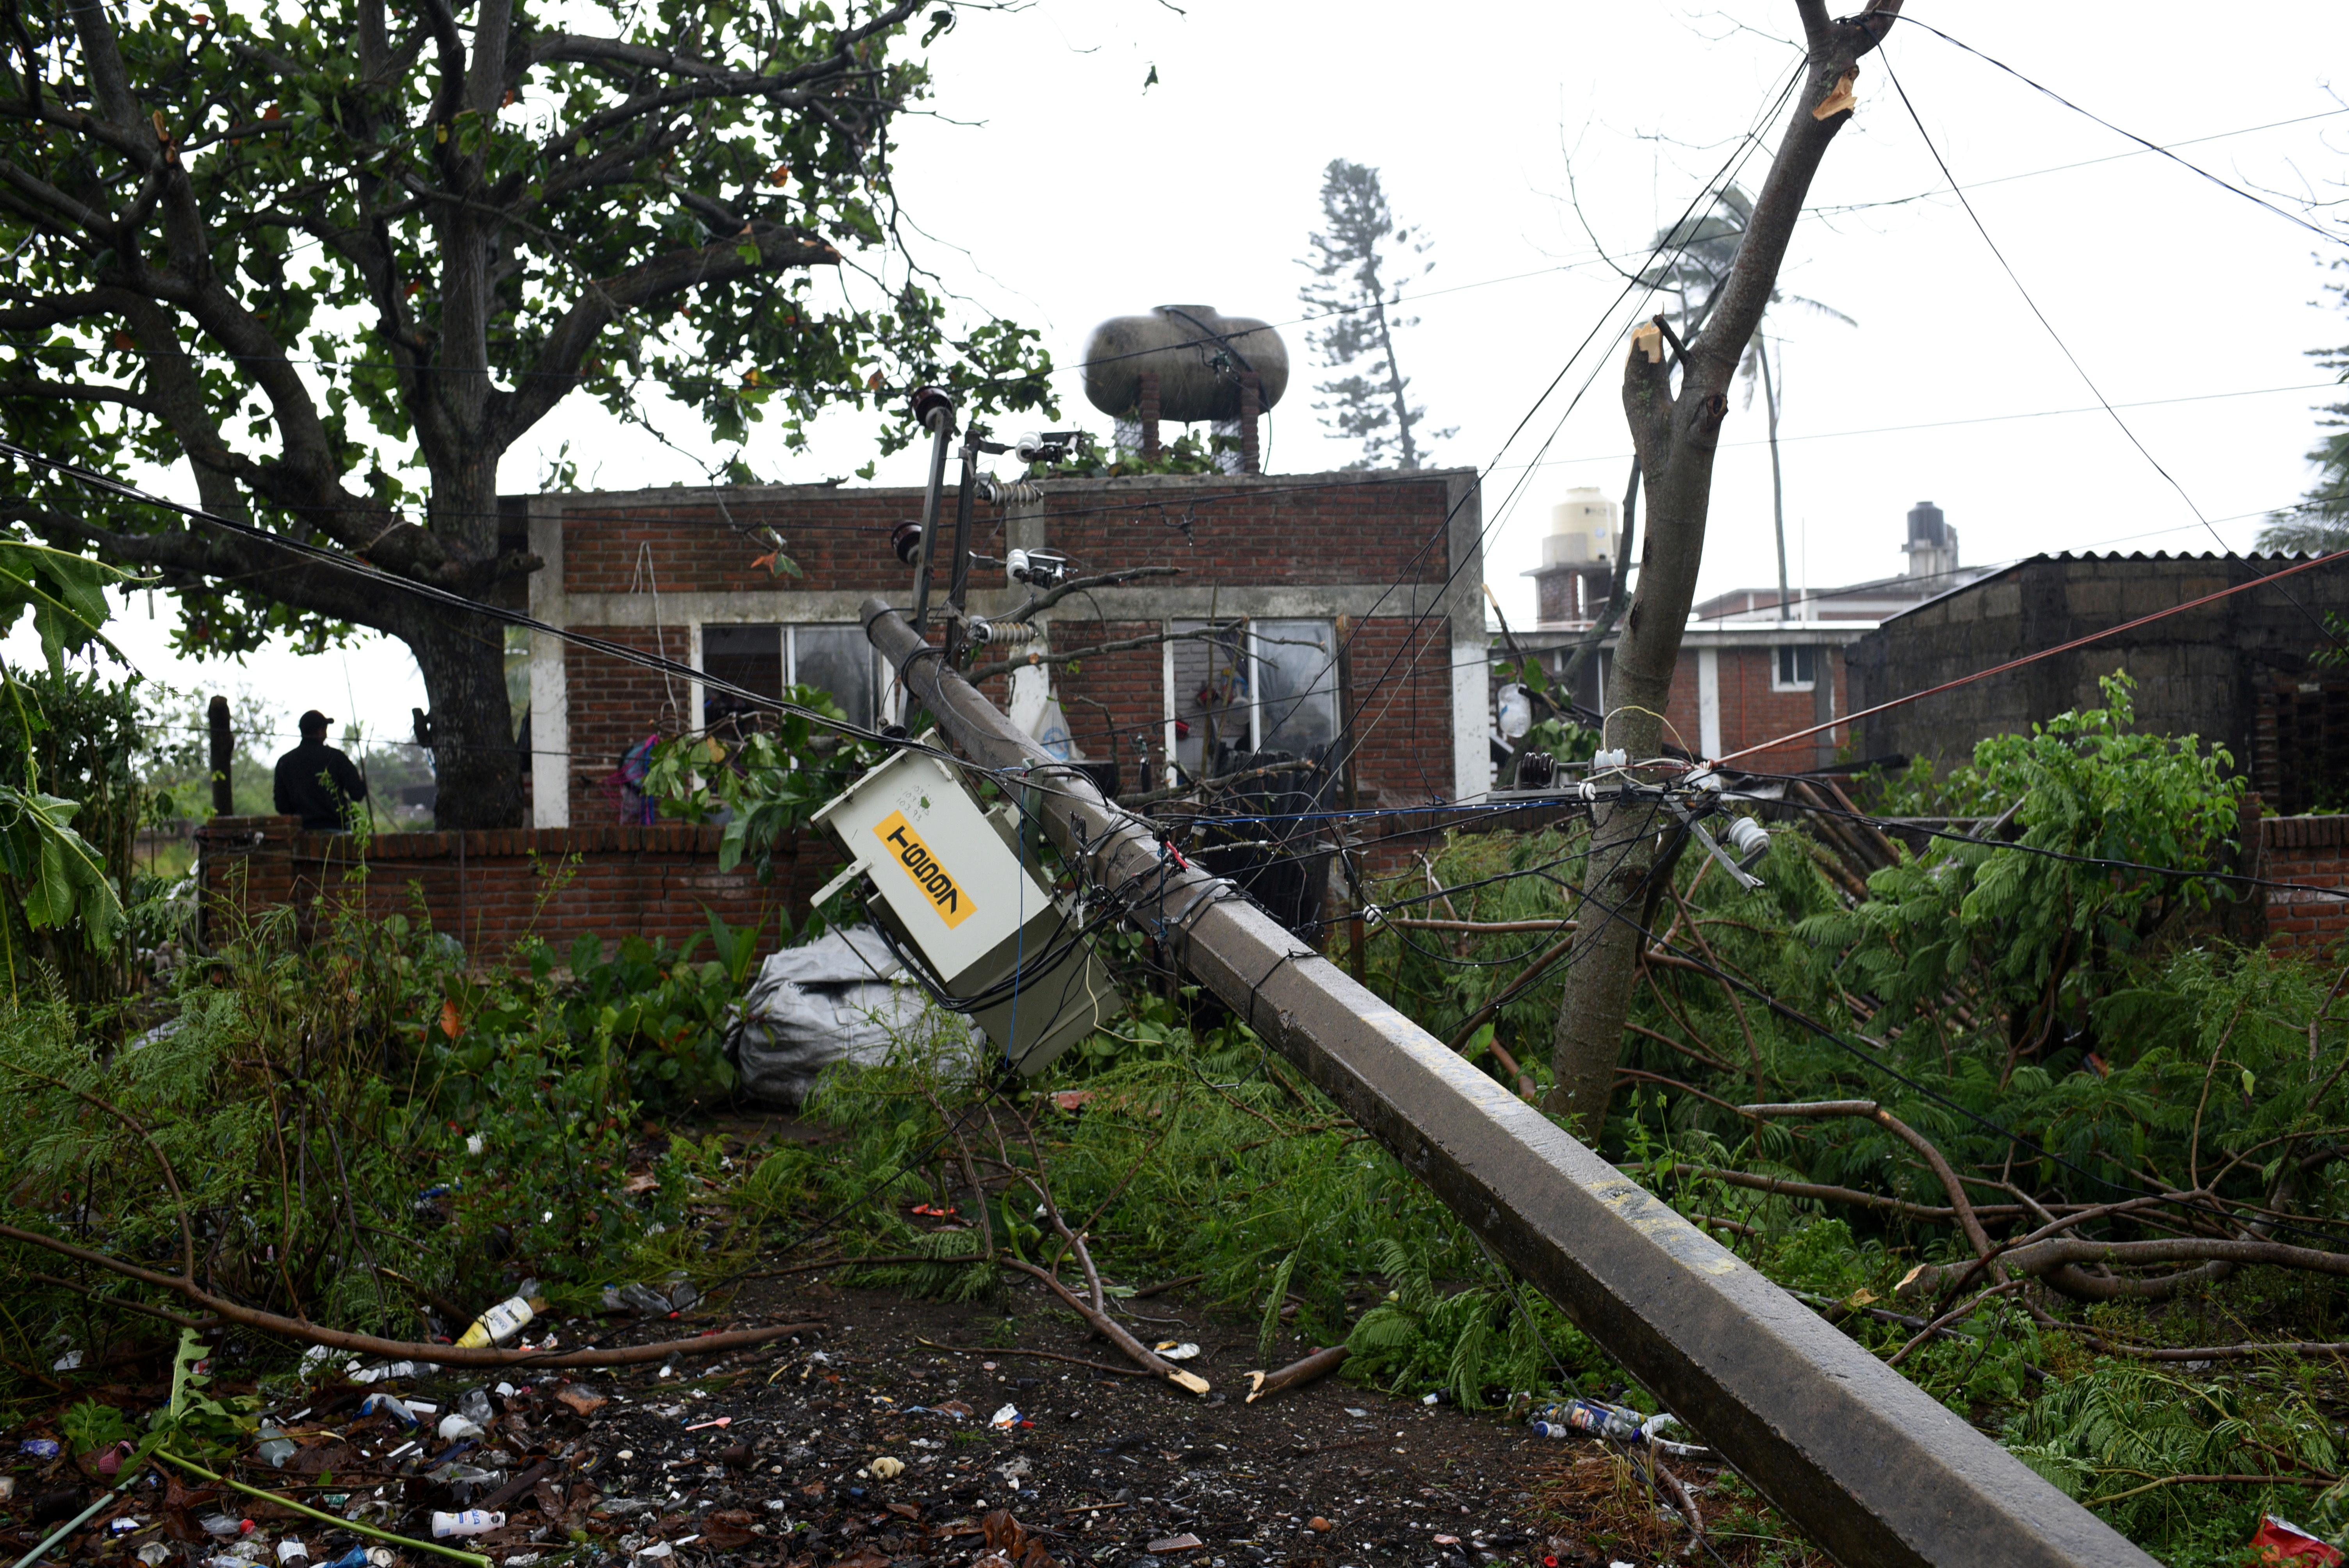 A fallen power pole lies next to houses after Hurricane Grace slammed into the coast with torrential rains, in Costa Esmeralda, near Tecolutla, Mexico August 21, 2021.   REUTERS/Yahir Ceballos